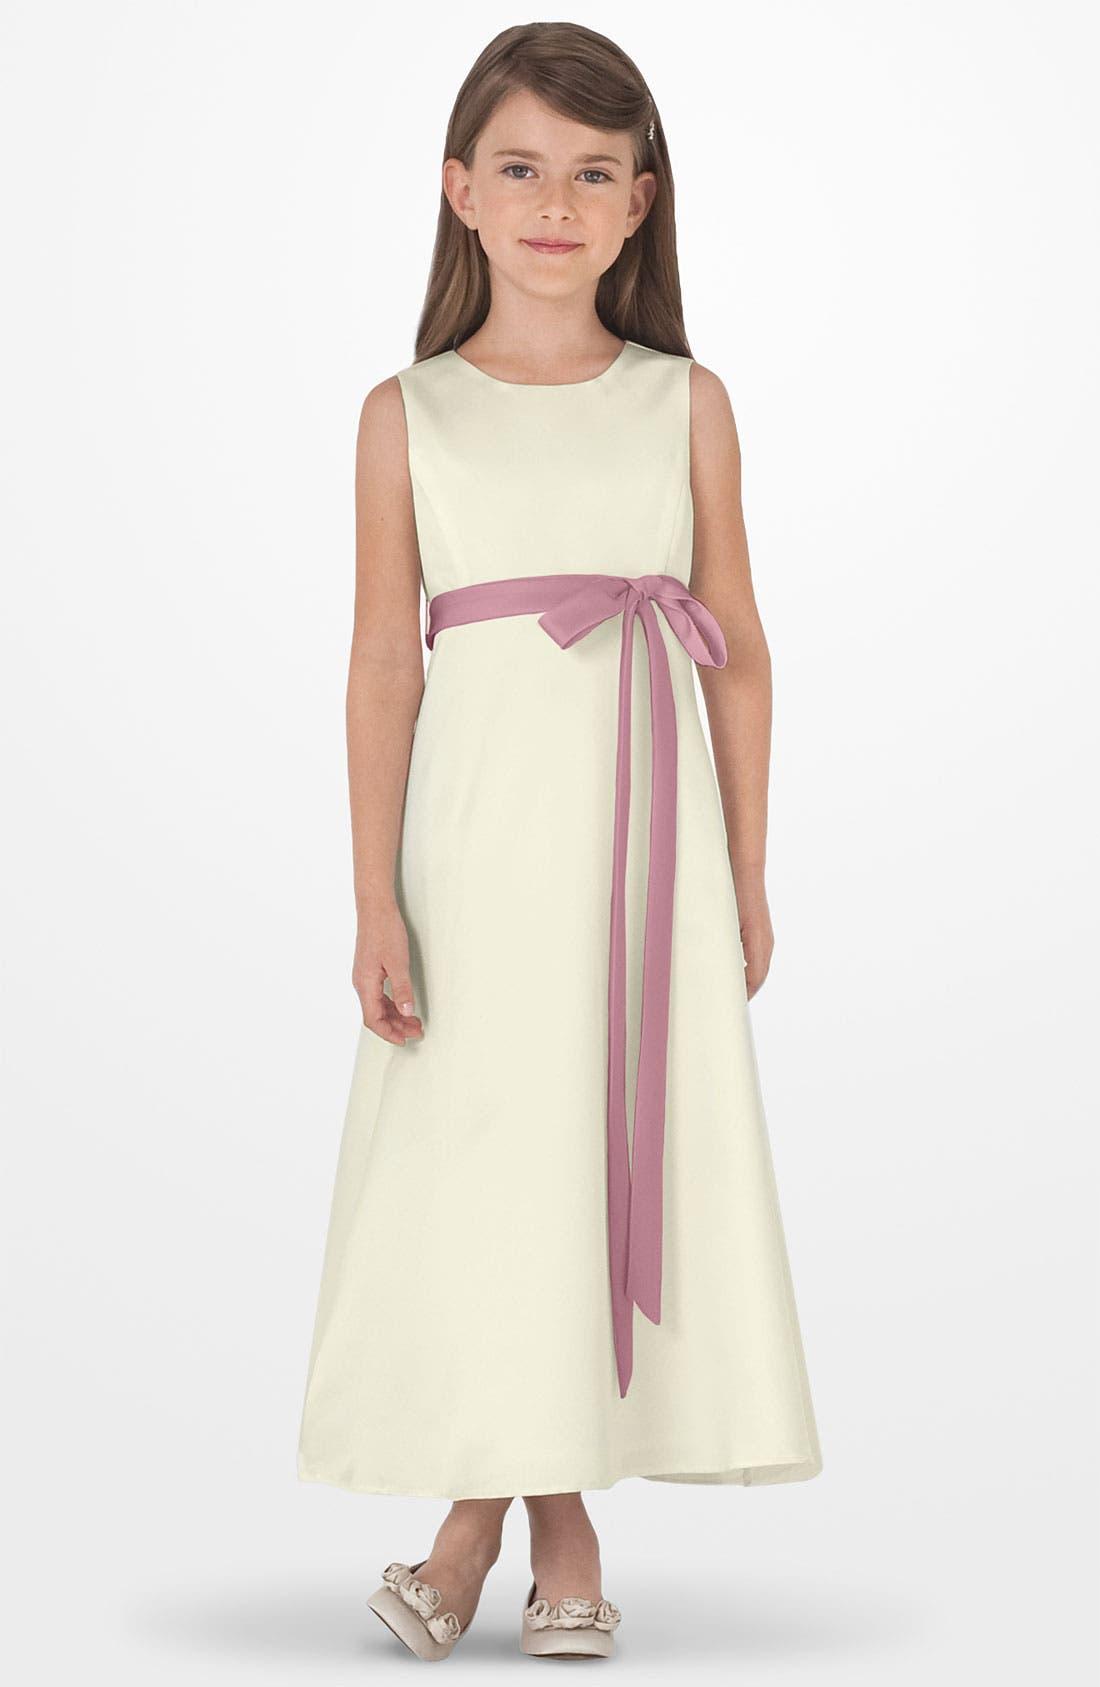 Sleeveless Satin Dress,                             Main thumbnail 1, color,                             Ivory/ rose petal